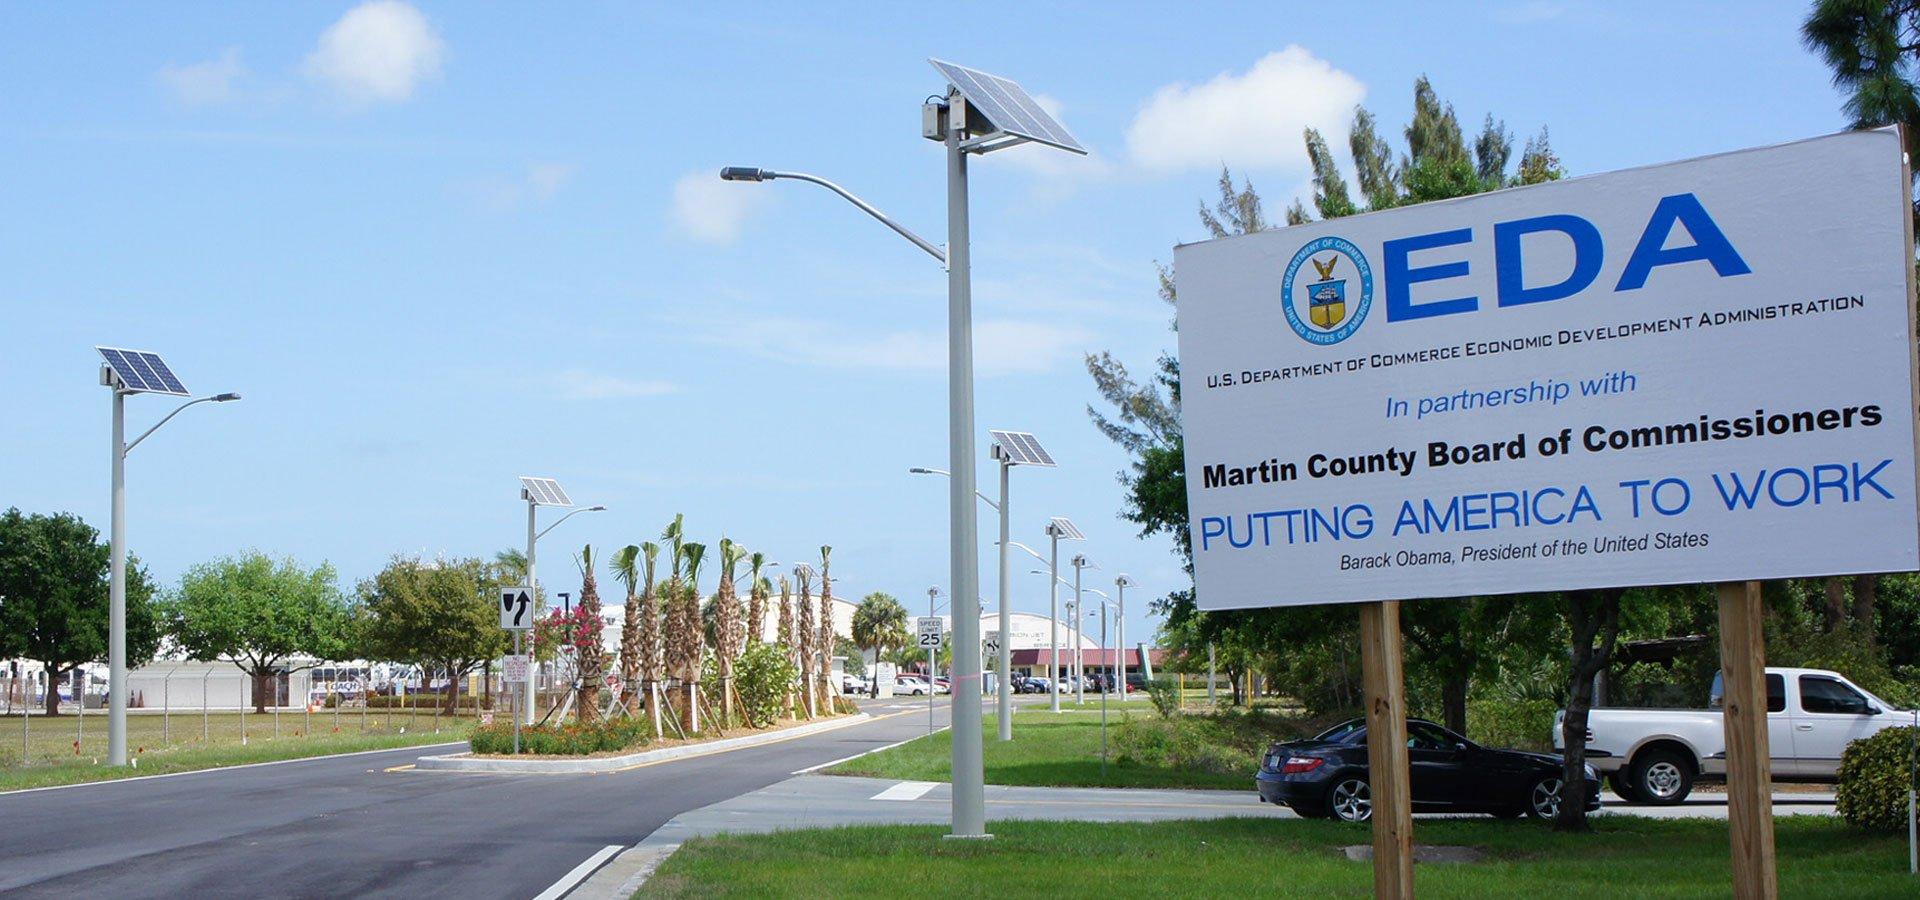 Solar LED Street Lighting Martin County Airport Road